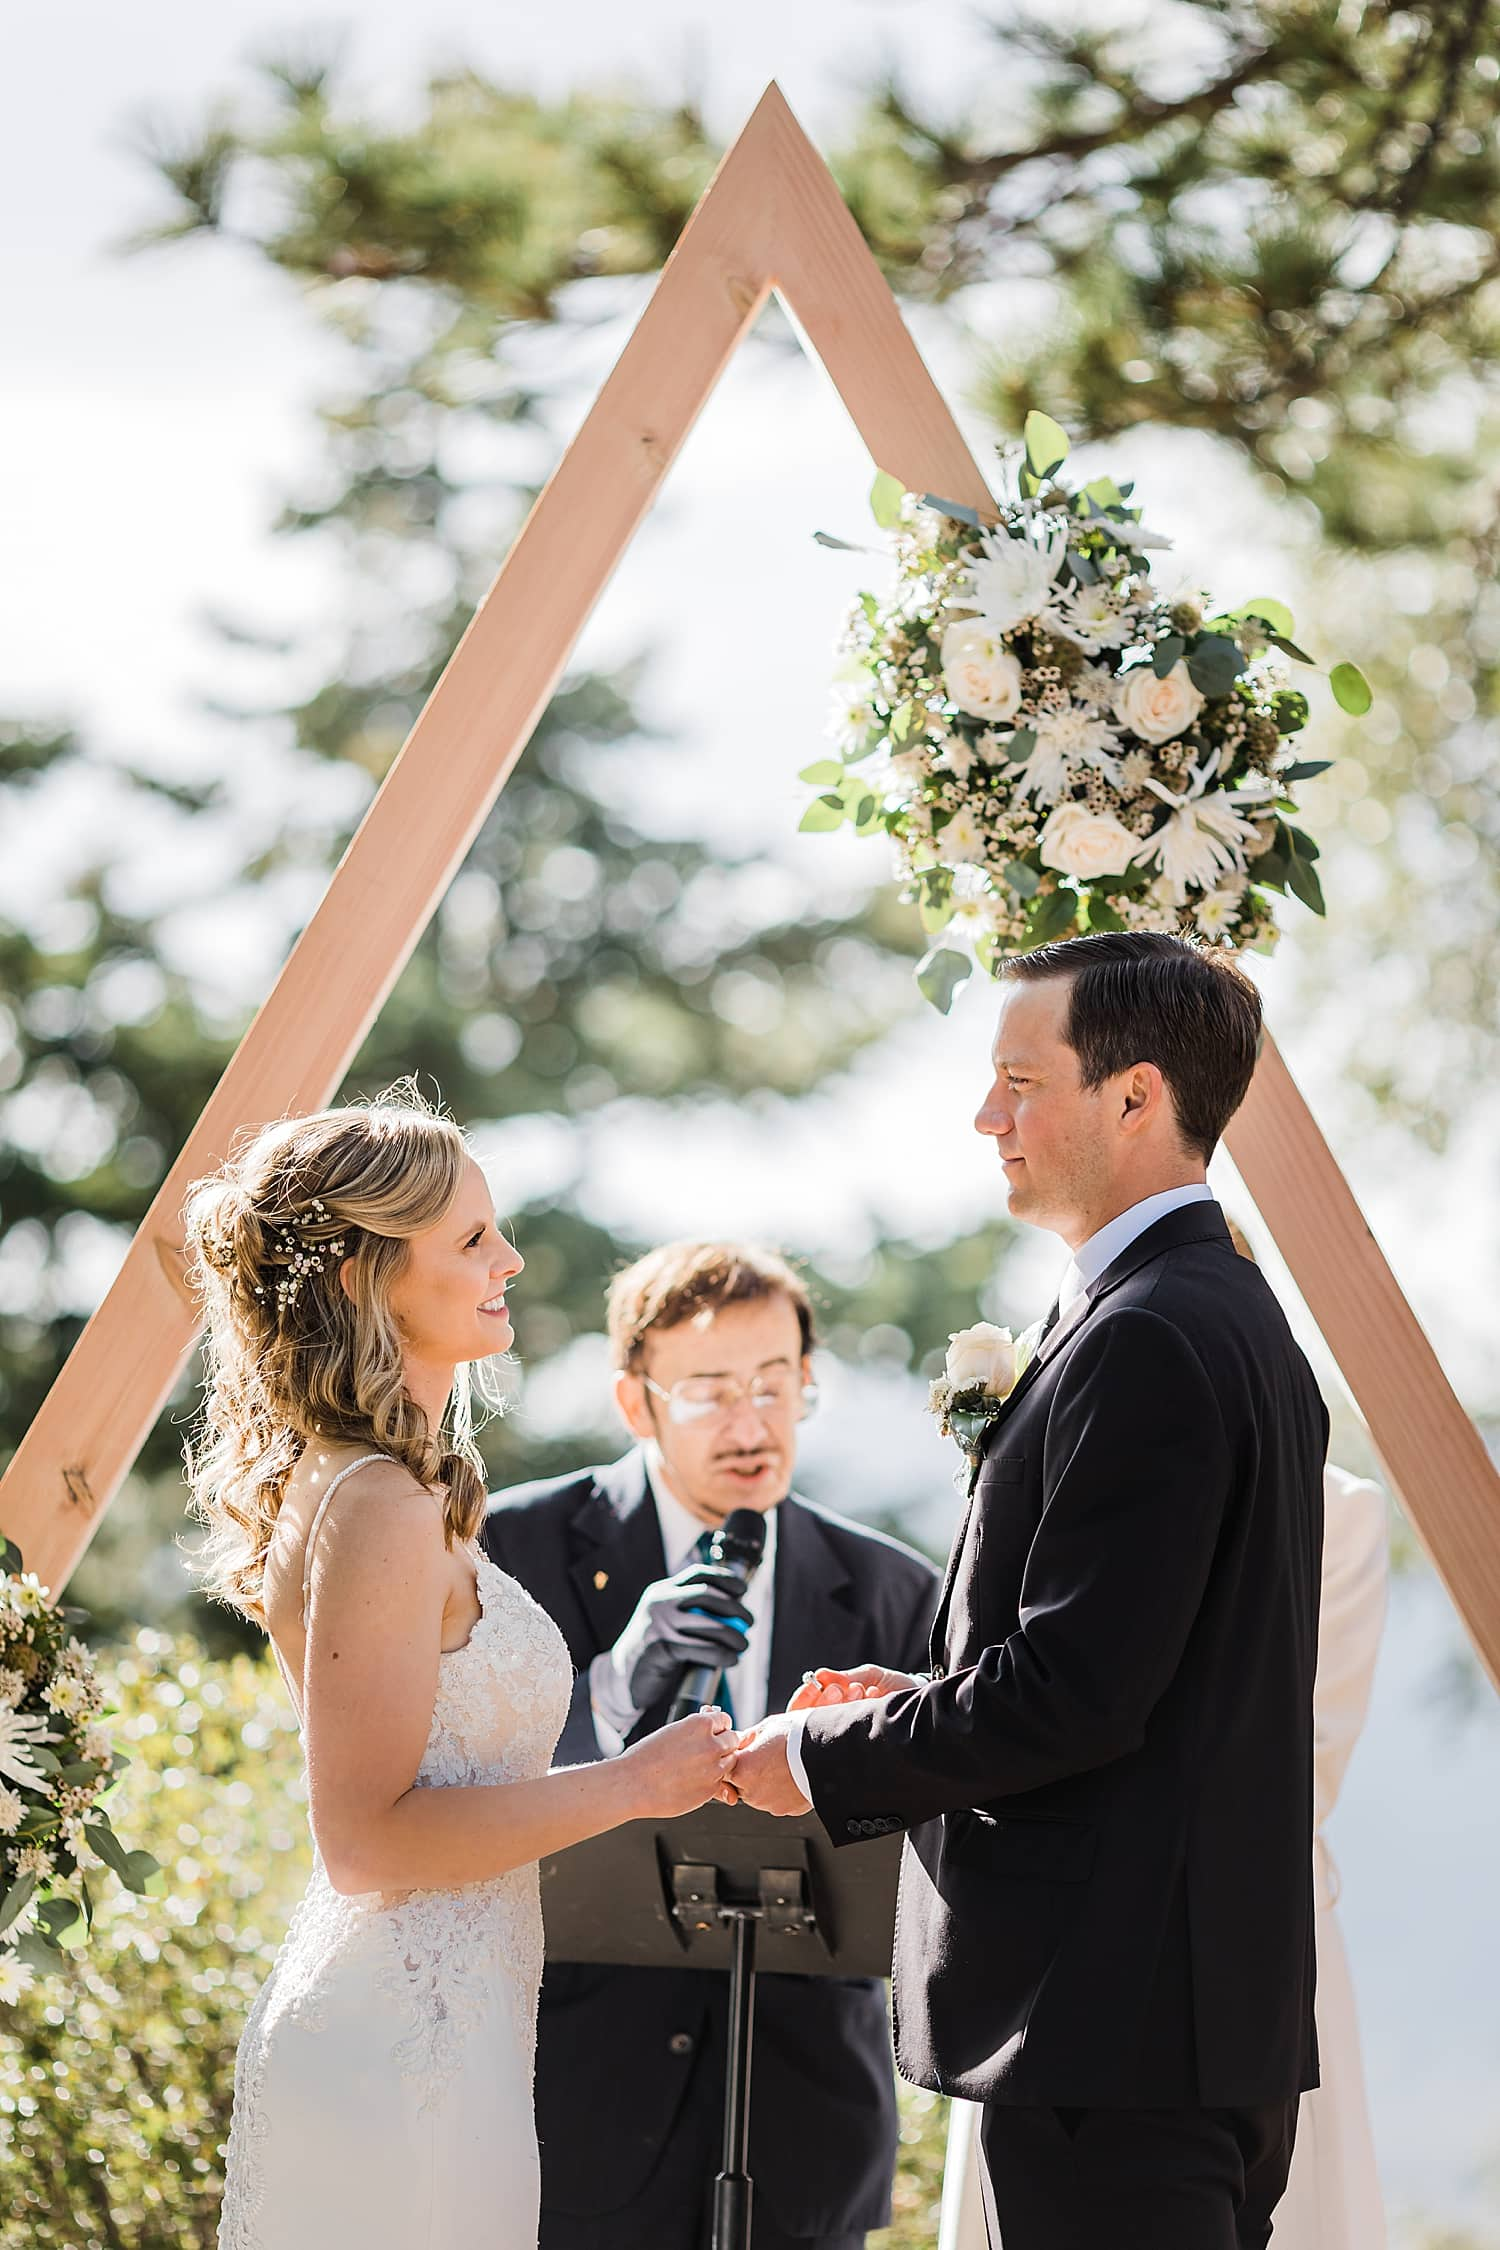 Idyllwild-wedding-elopement-mountain-wedding-pine-cove-southern-california-adventure-wedding-adventure-elopement